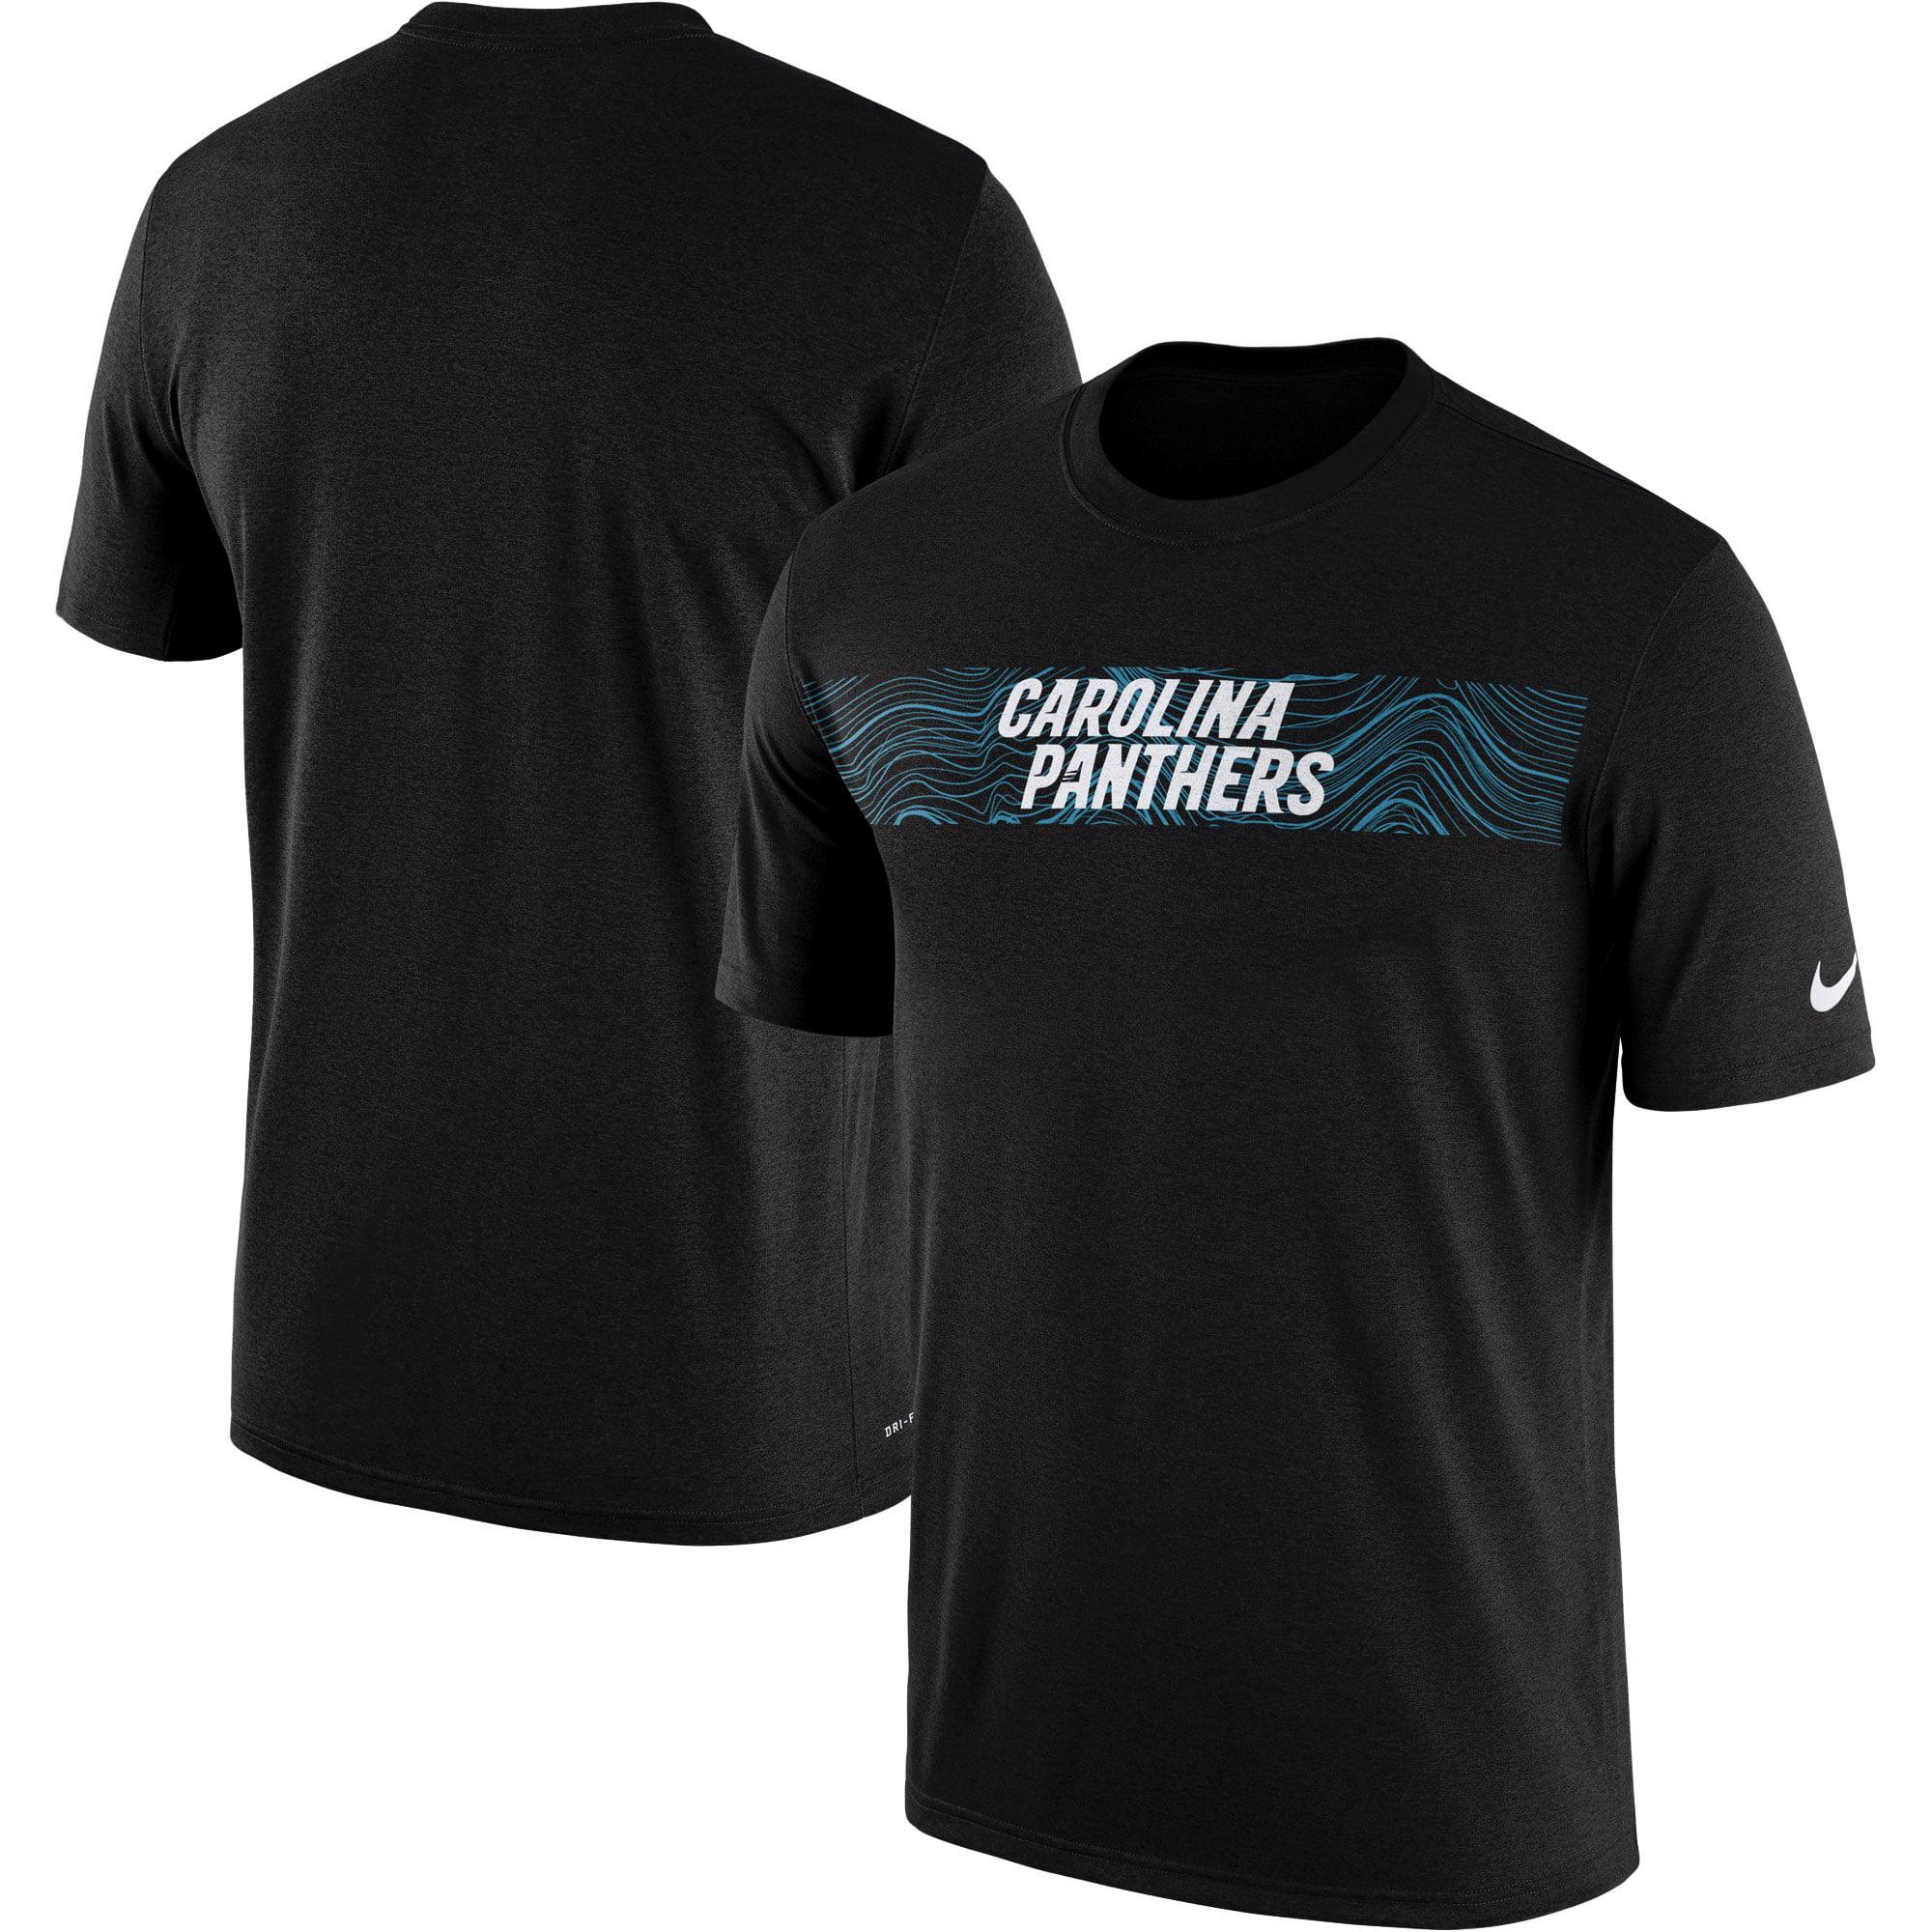 Carolina Panthers Nike Sideline Seismic Legend Performance T-Shirt - Black